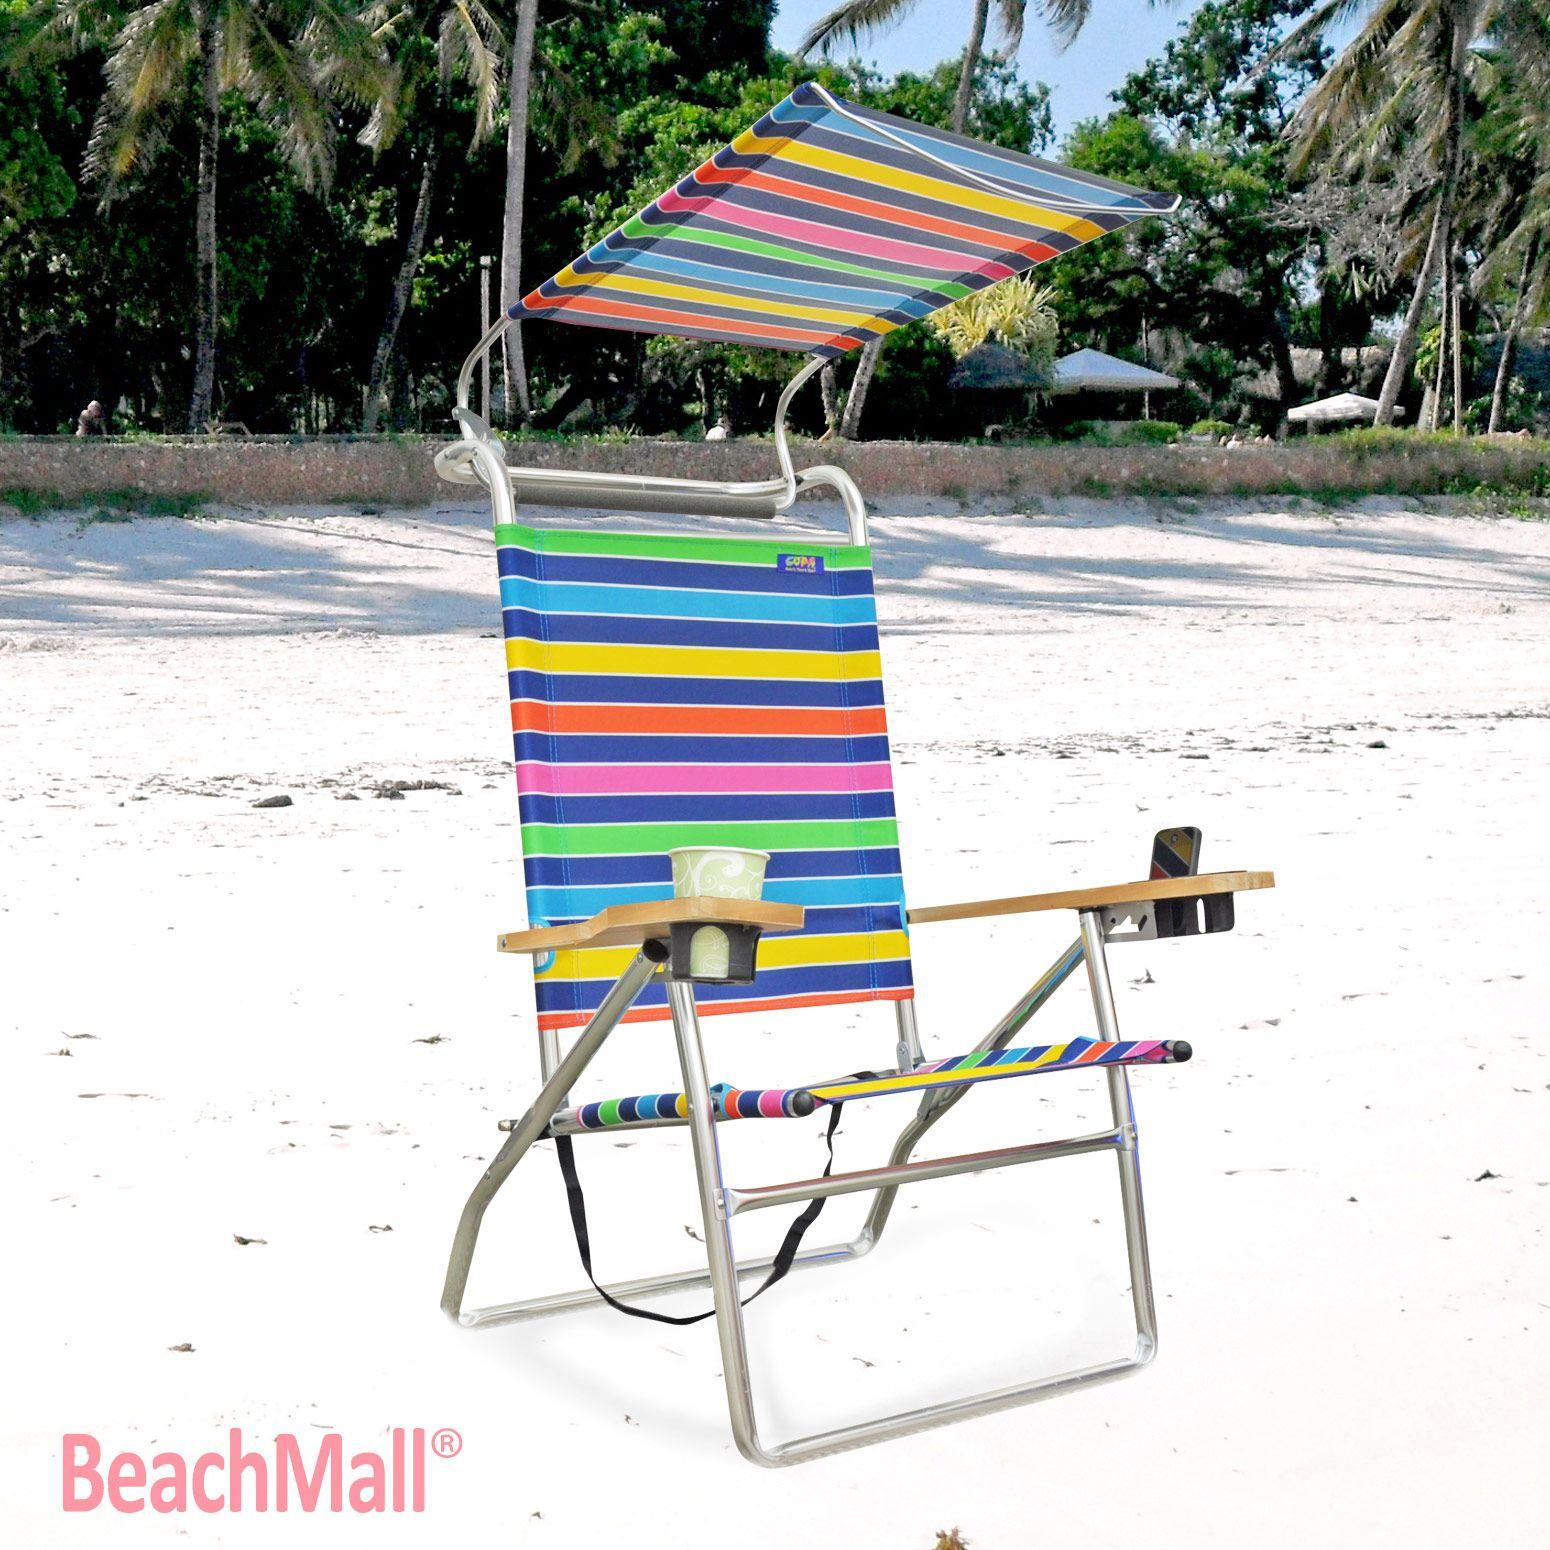 Rio Brands Genuine Beach Bum Chair w Cup holder